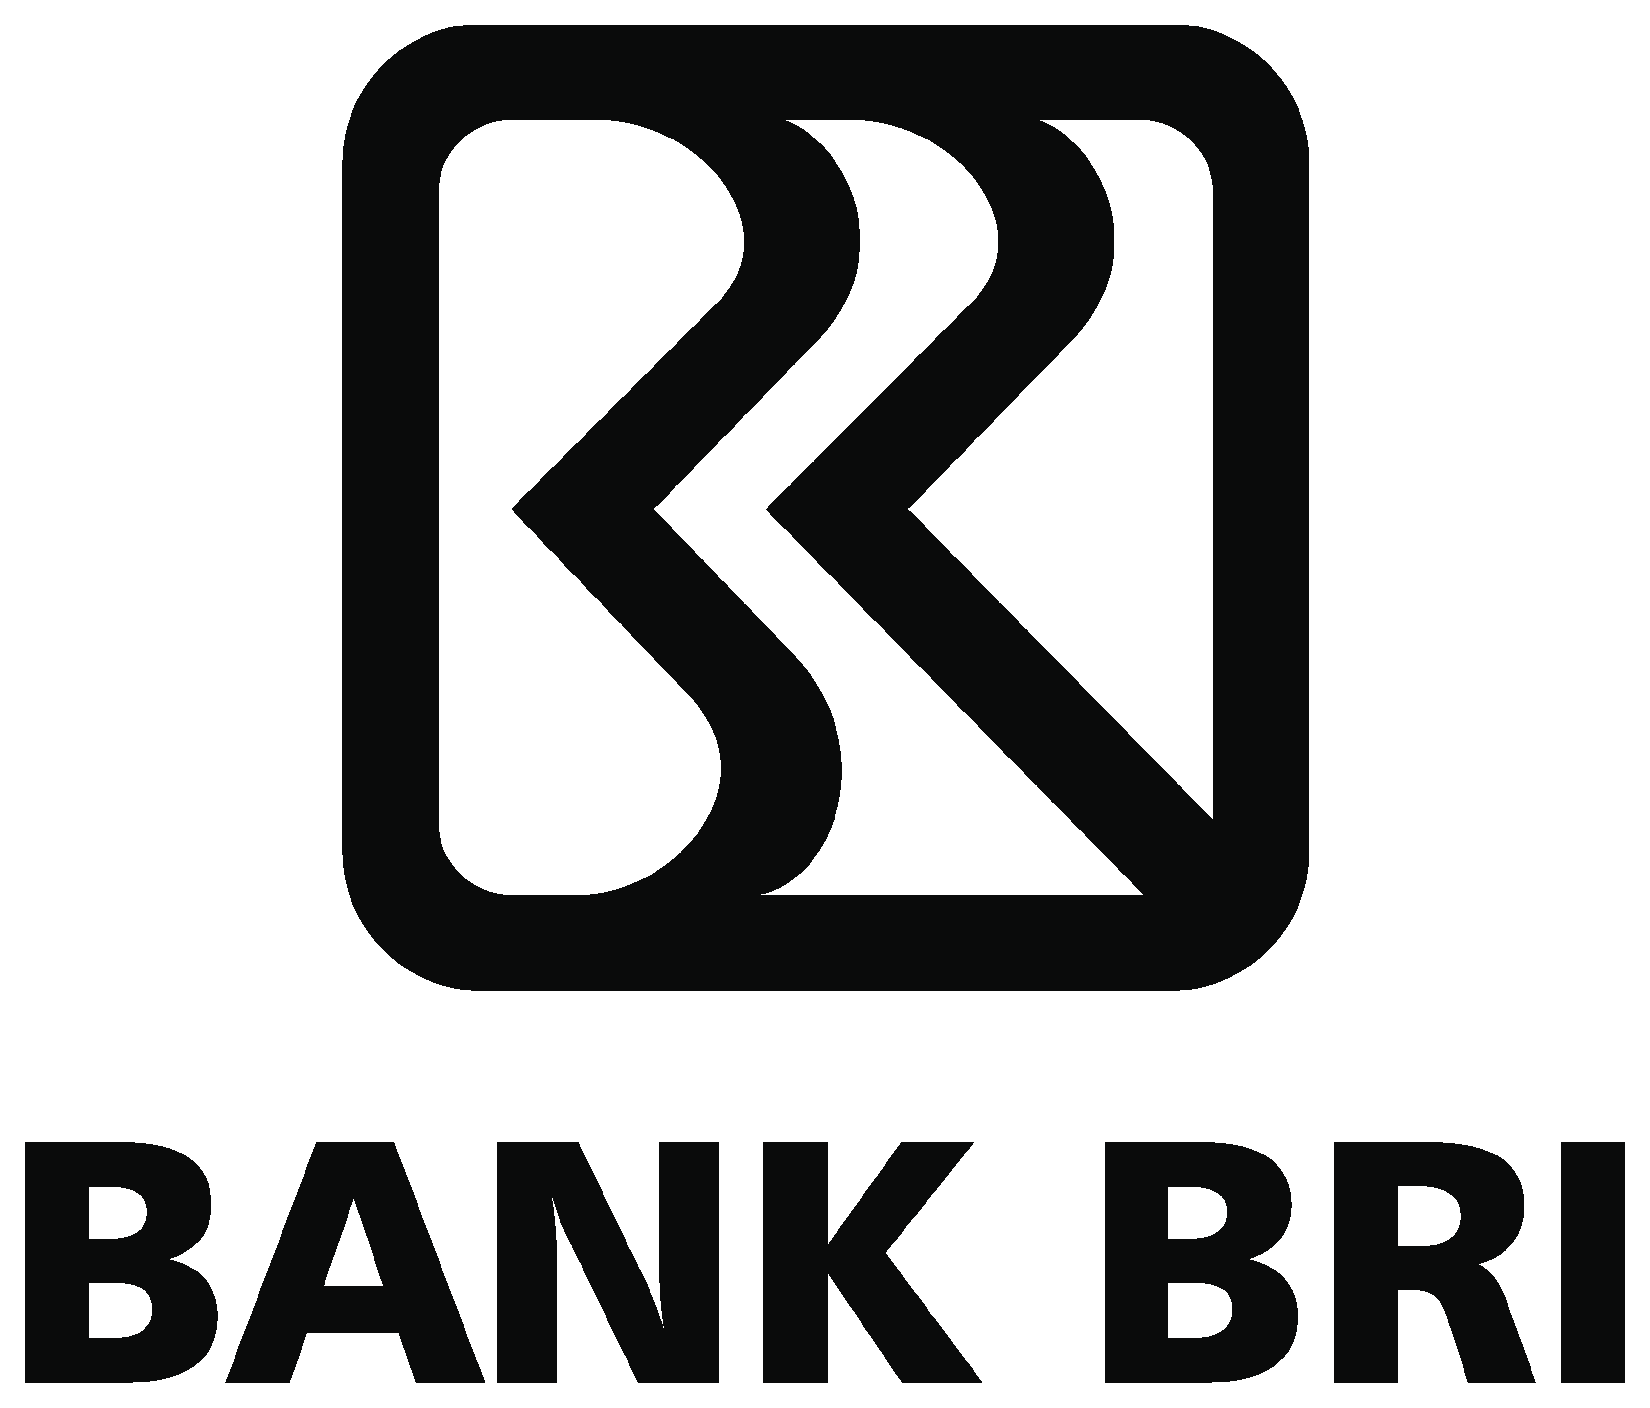 Logo BRI (Bank Rakyat Indonesia)Hitam Putih